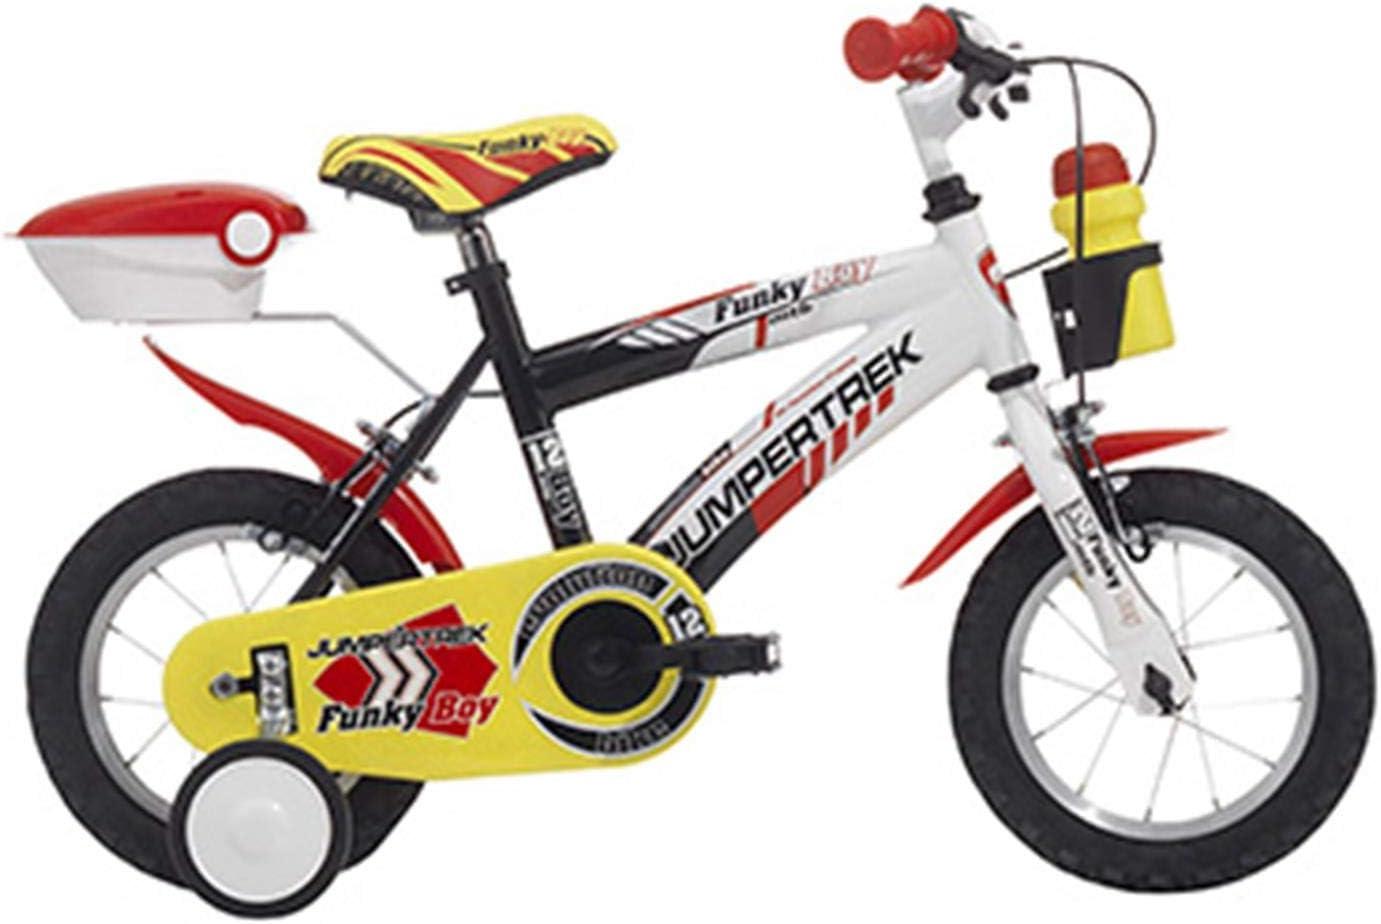 Bicicleta infantil 12 JumpERTREK FUNKY de acero GARCON NEGRO